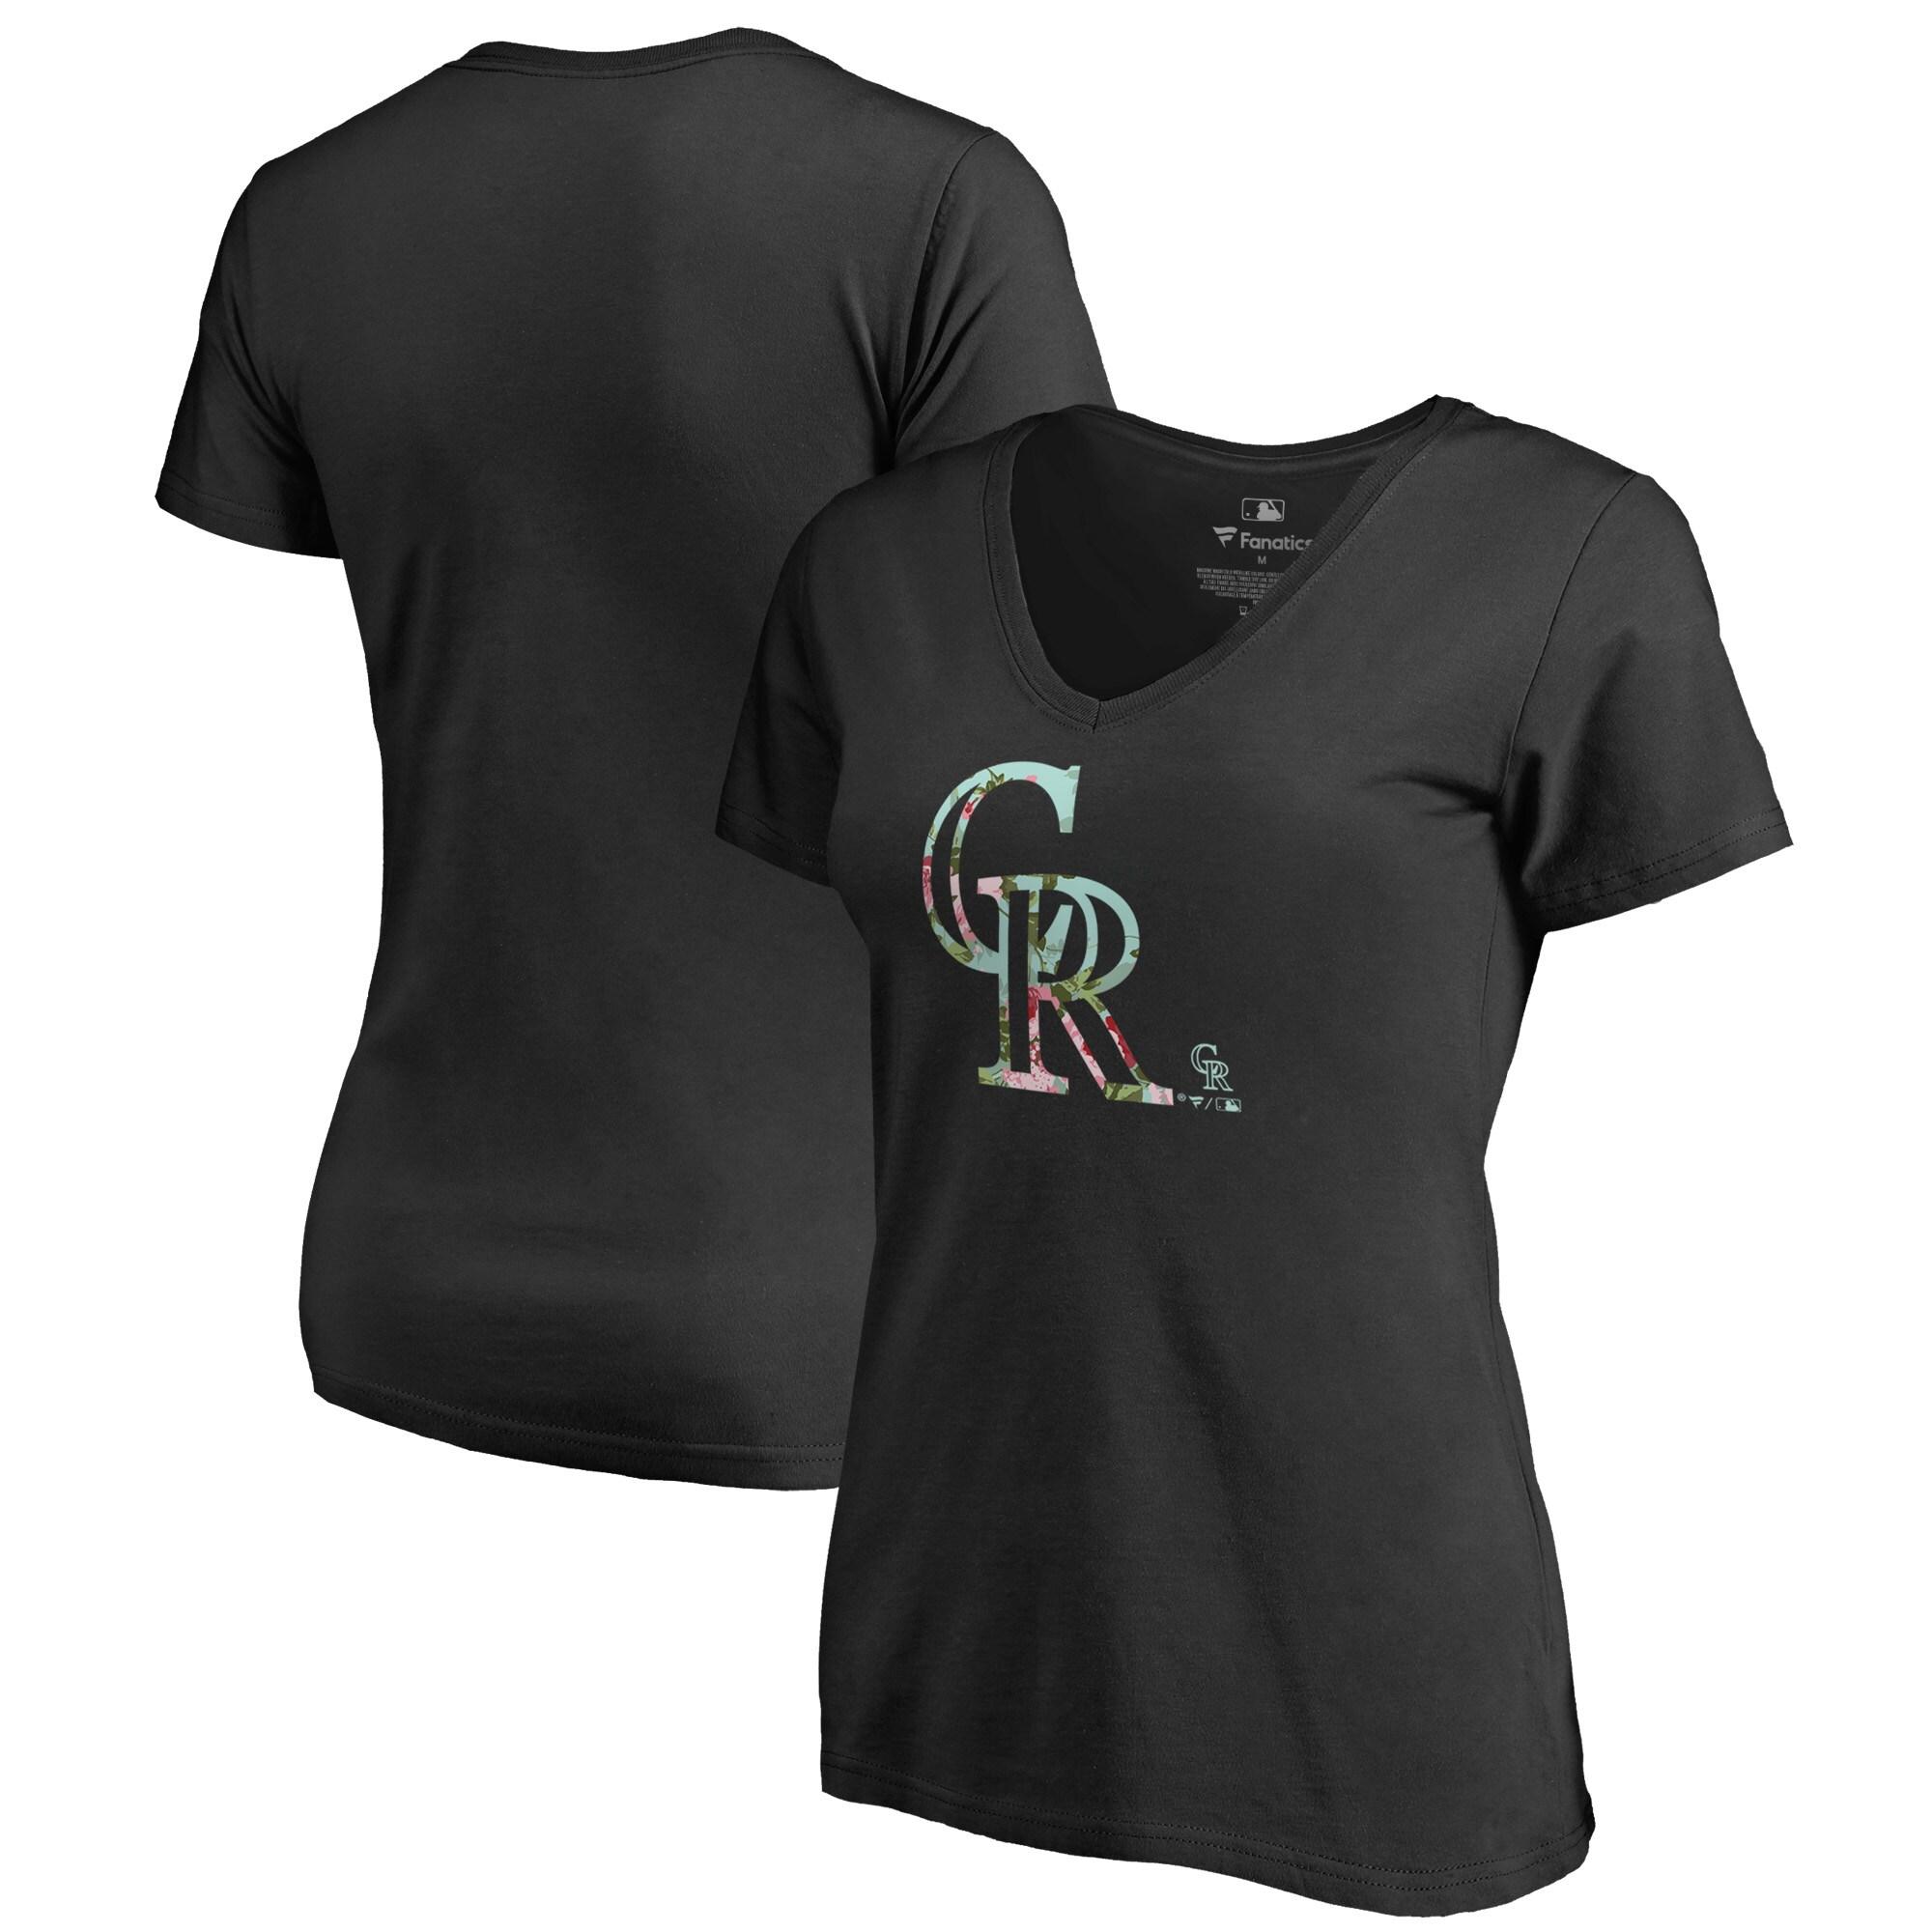 Colorado Rockies Fanatics Branded Women's Lovely Plus Size V-Neck T-Shirt - Black